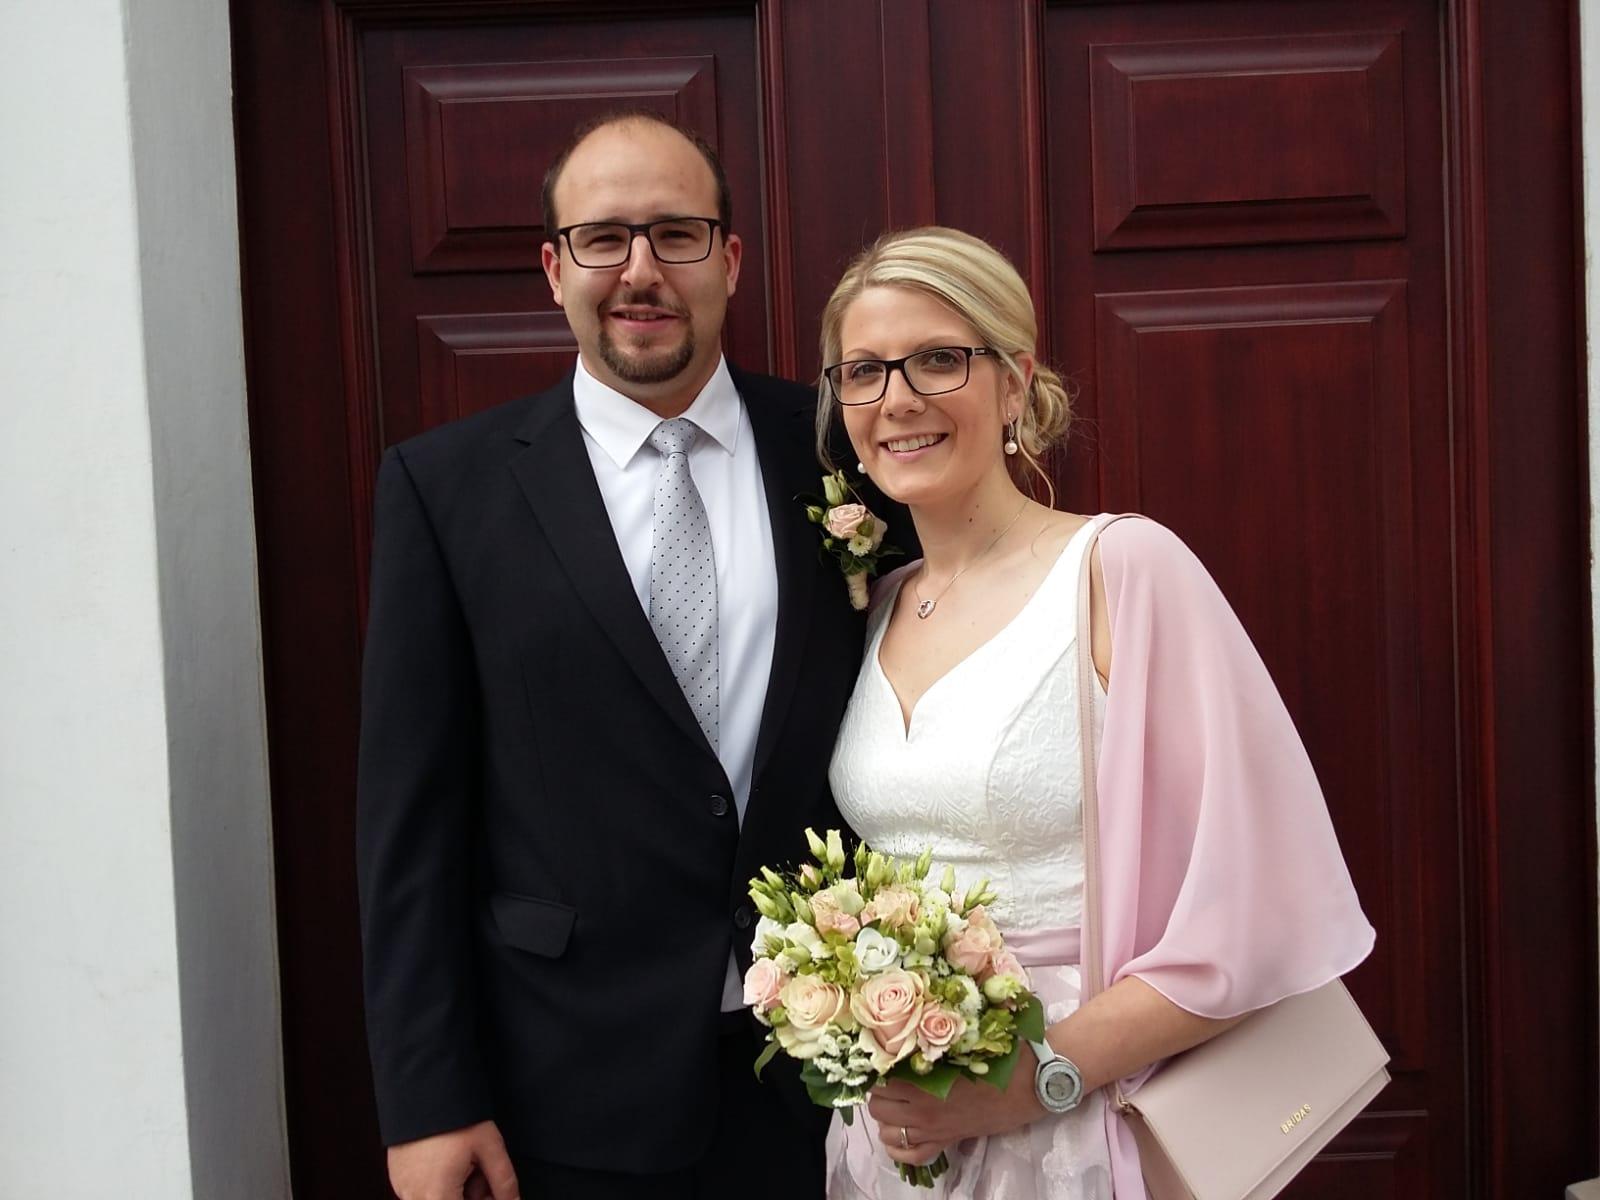 Susanne Rameder & Thomas Grünsteidl